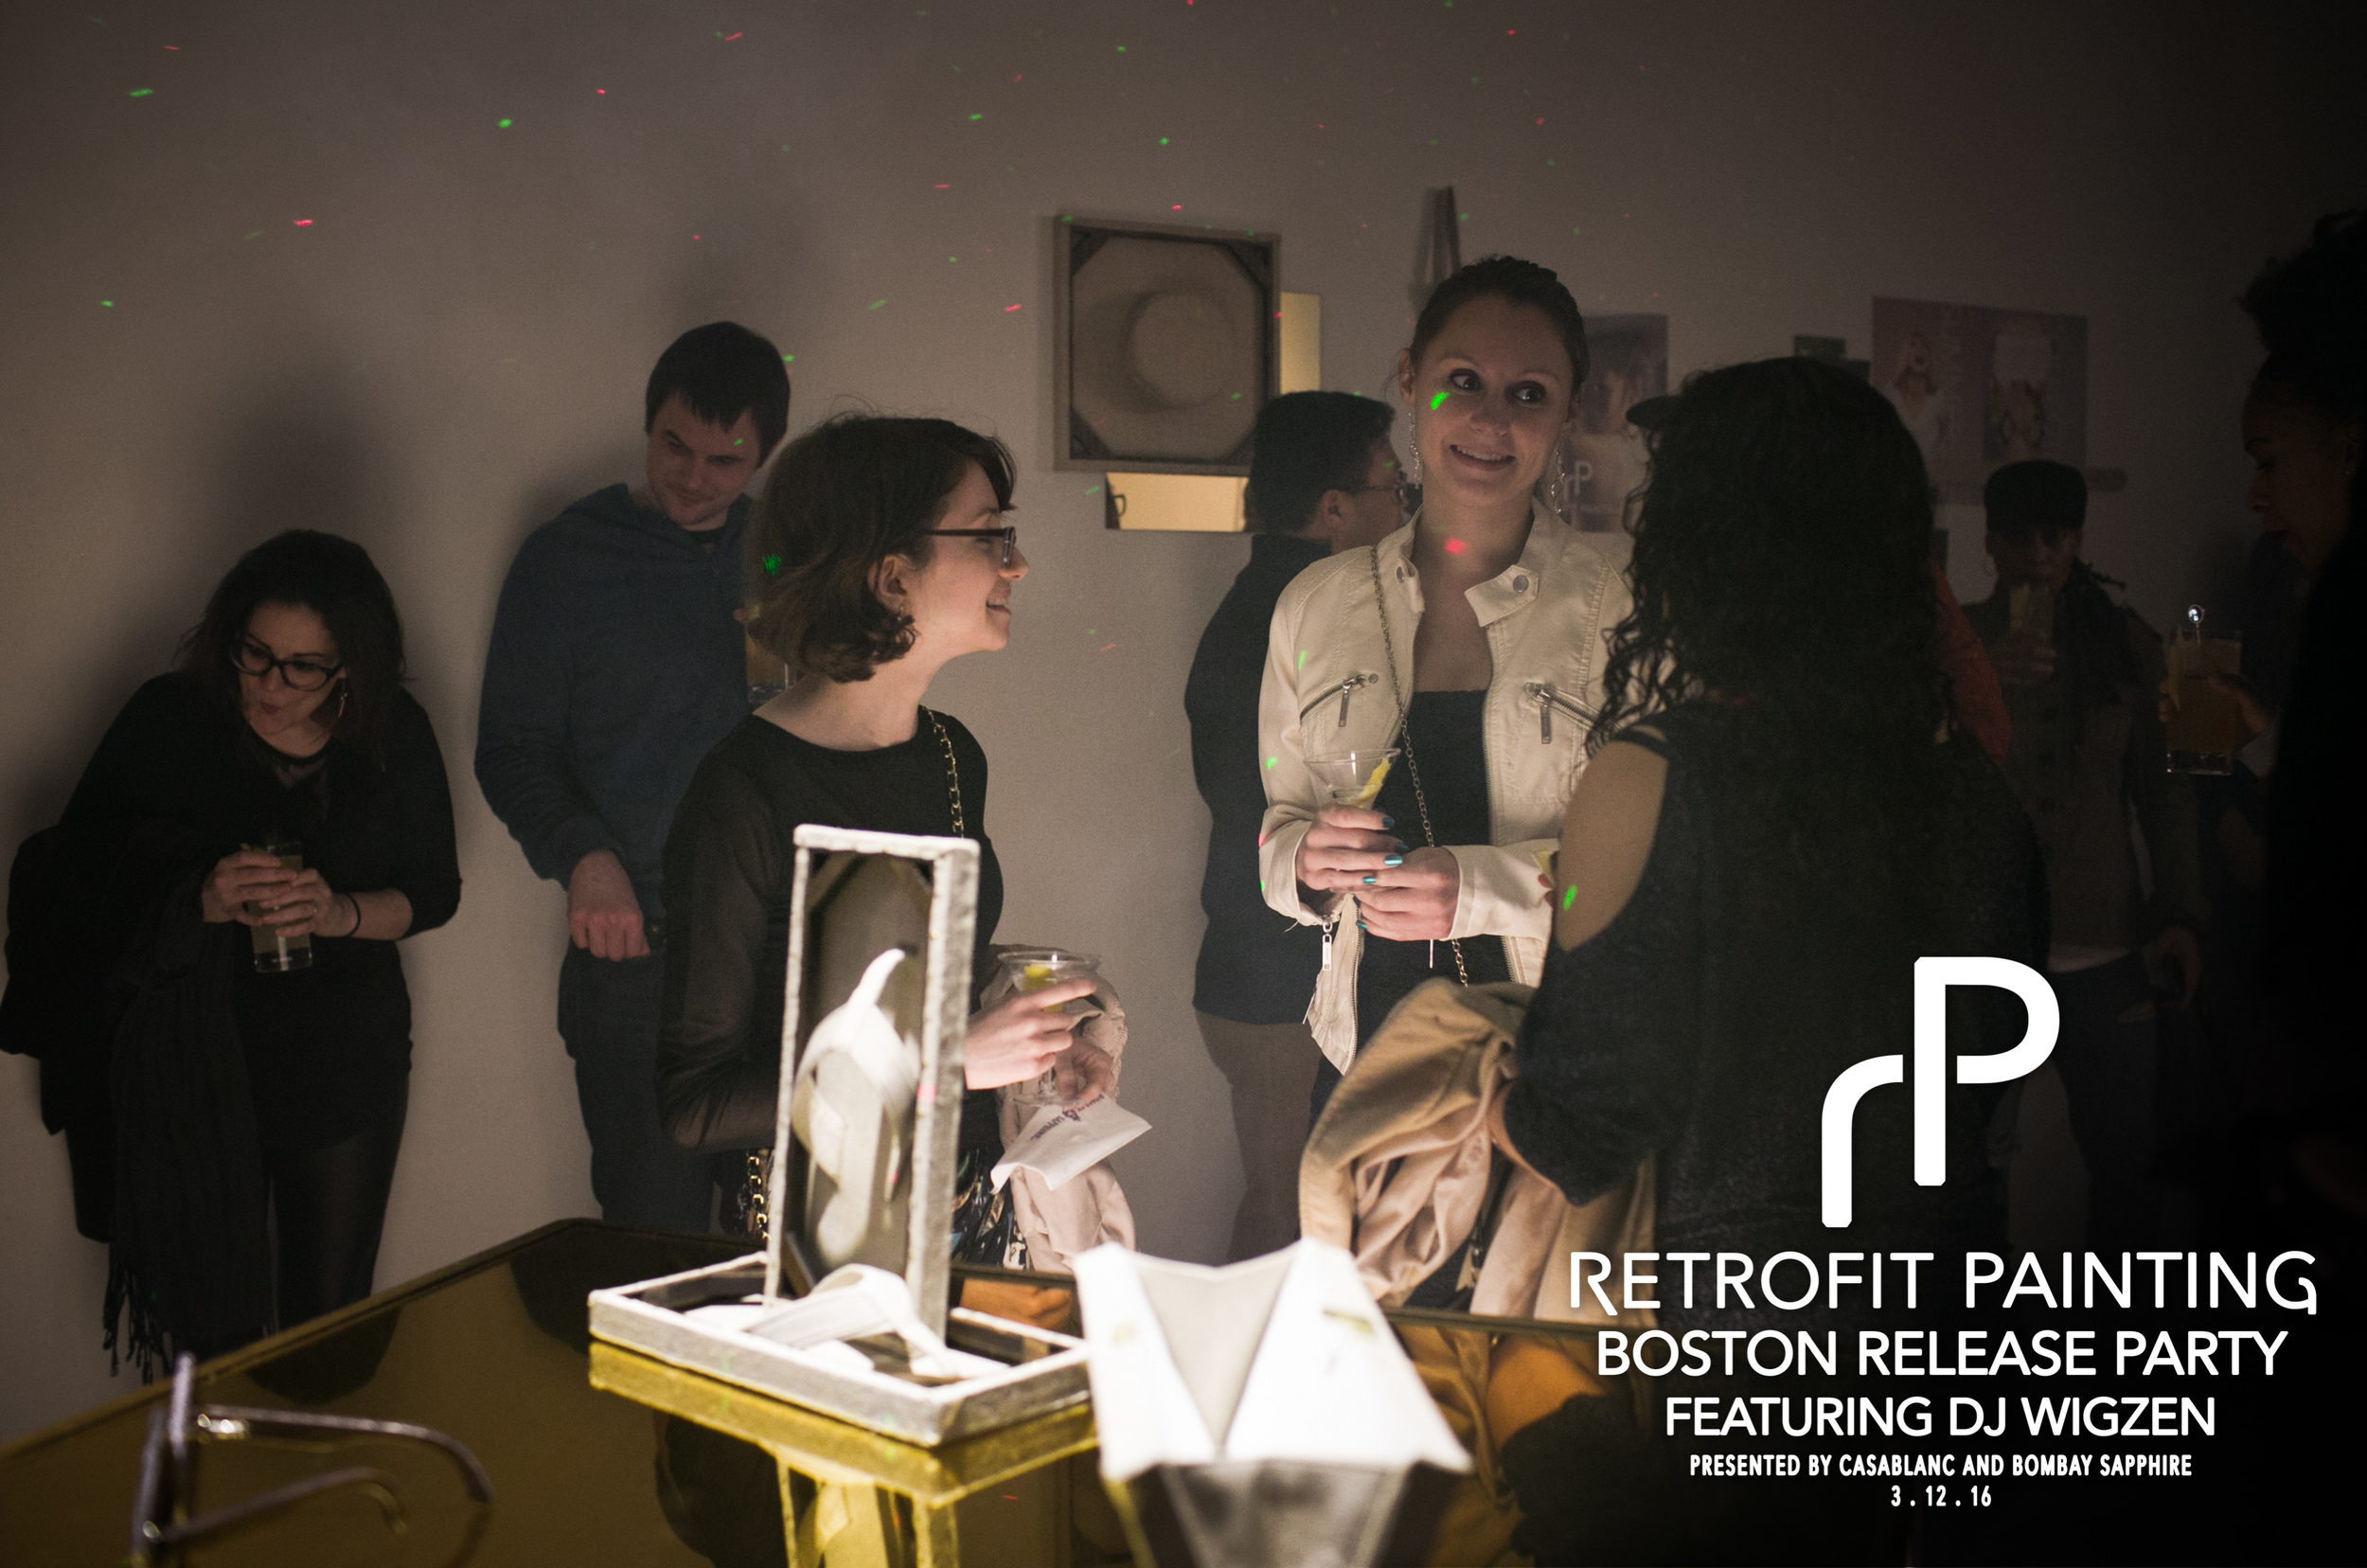 Retrofit Painting Boston Release Party 0179.jpg